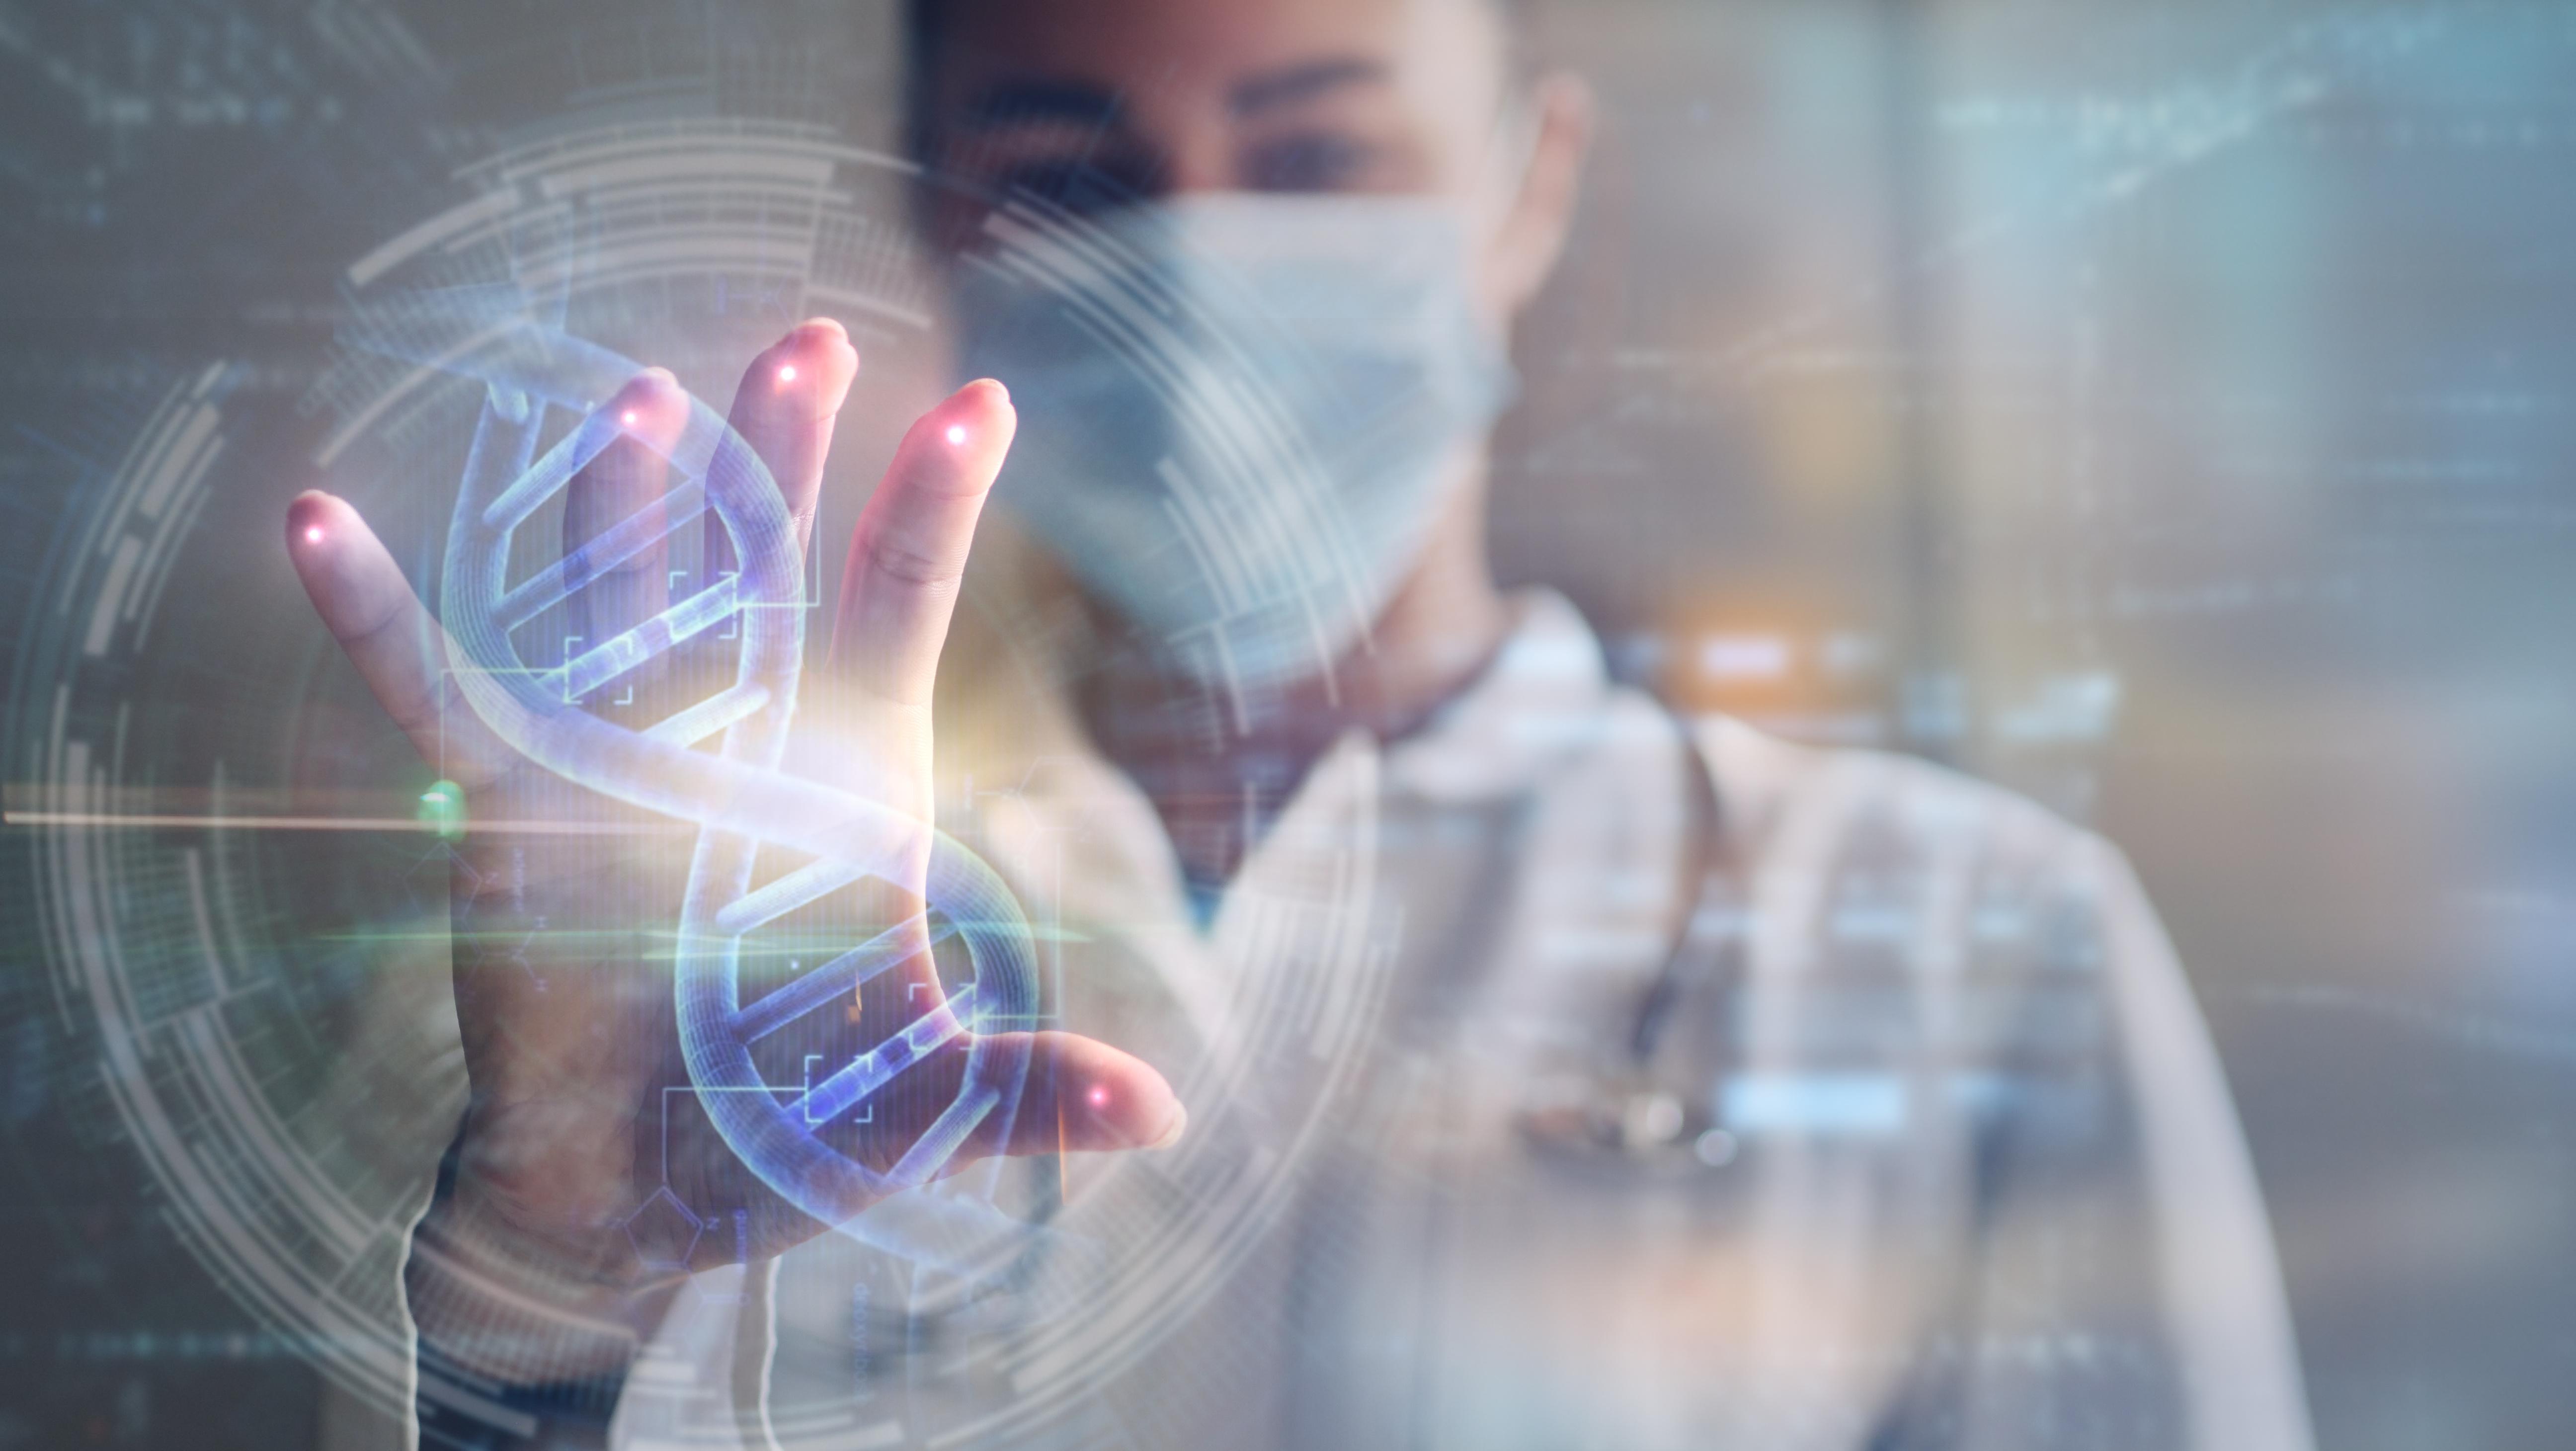 4 benefícios da medicina diagnóstica integrada com a Telemedicina Morsch